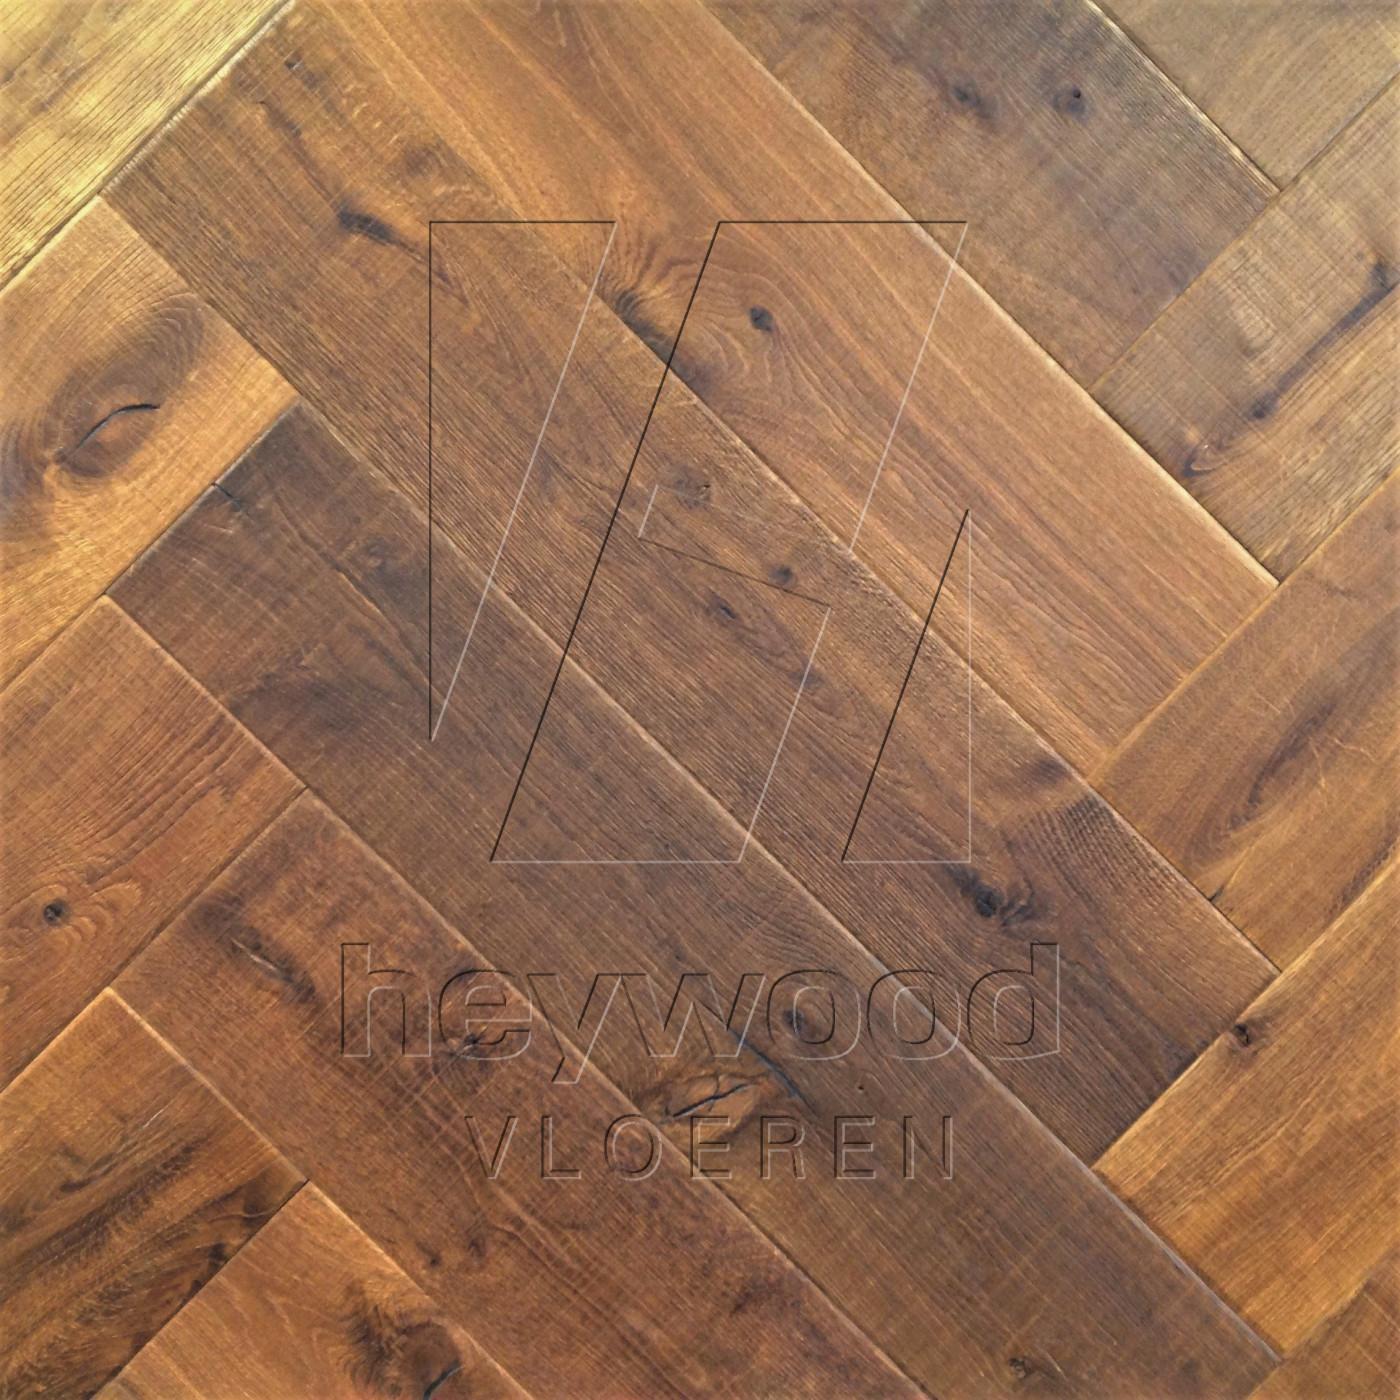 Knotting Hill Herringbone 'Galicia' in Herringbone of Pattern & Panel Floors